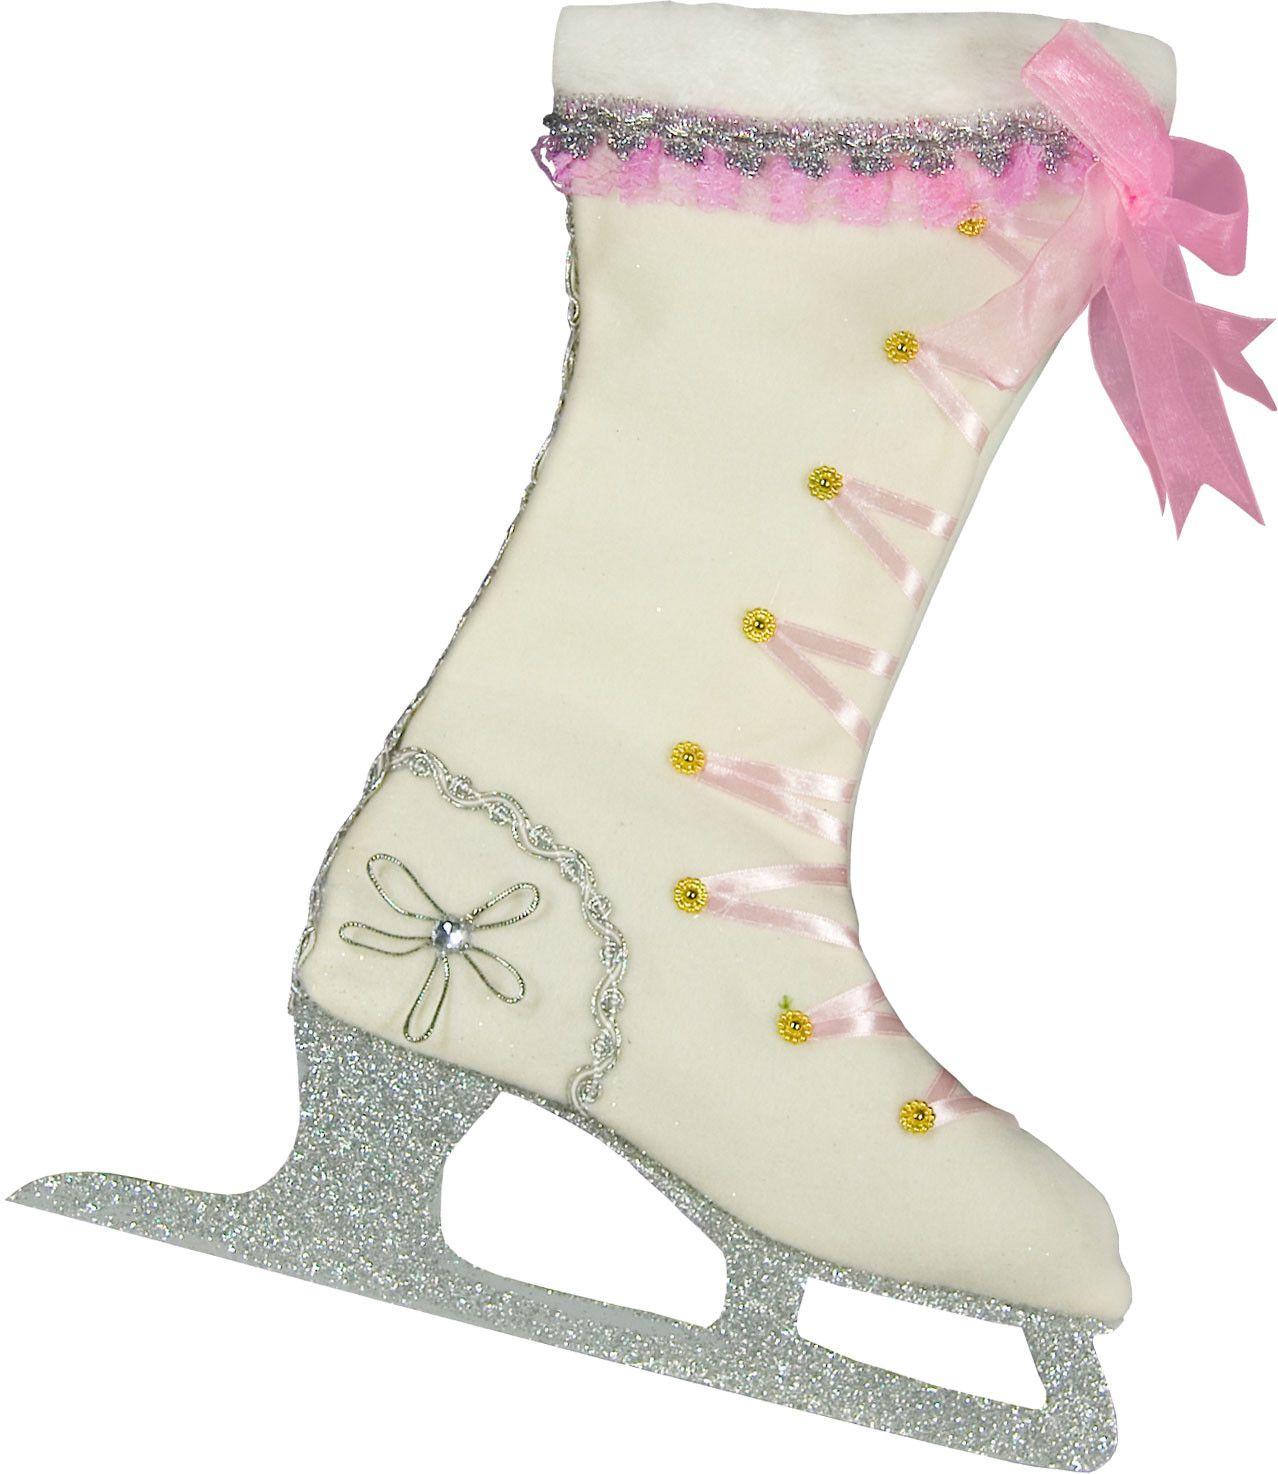 Google Image Result for http://www.christmaslightsetc.com/images/ProductCloseup/22170-ice-skate-white-fur-trim-pink-ribbon-stocking.jpg